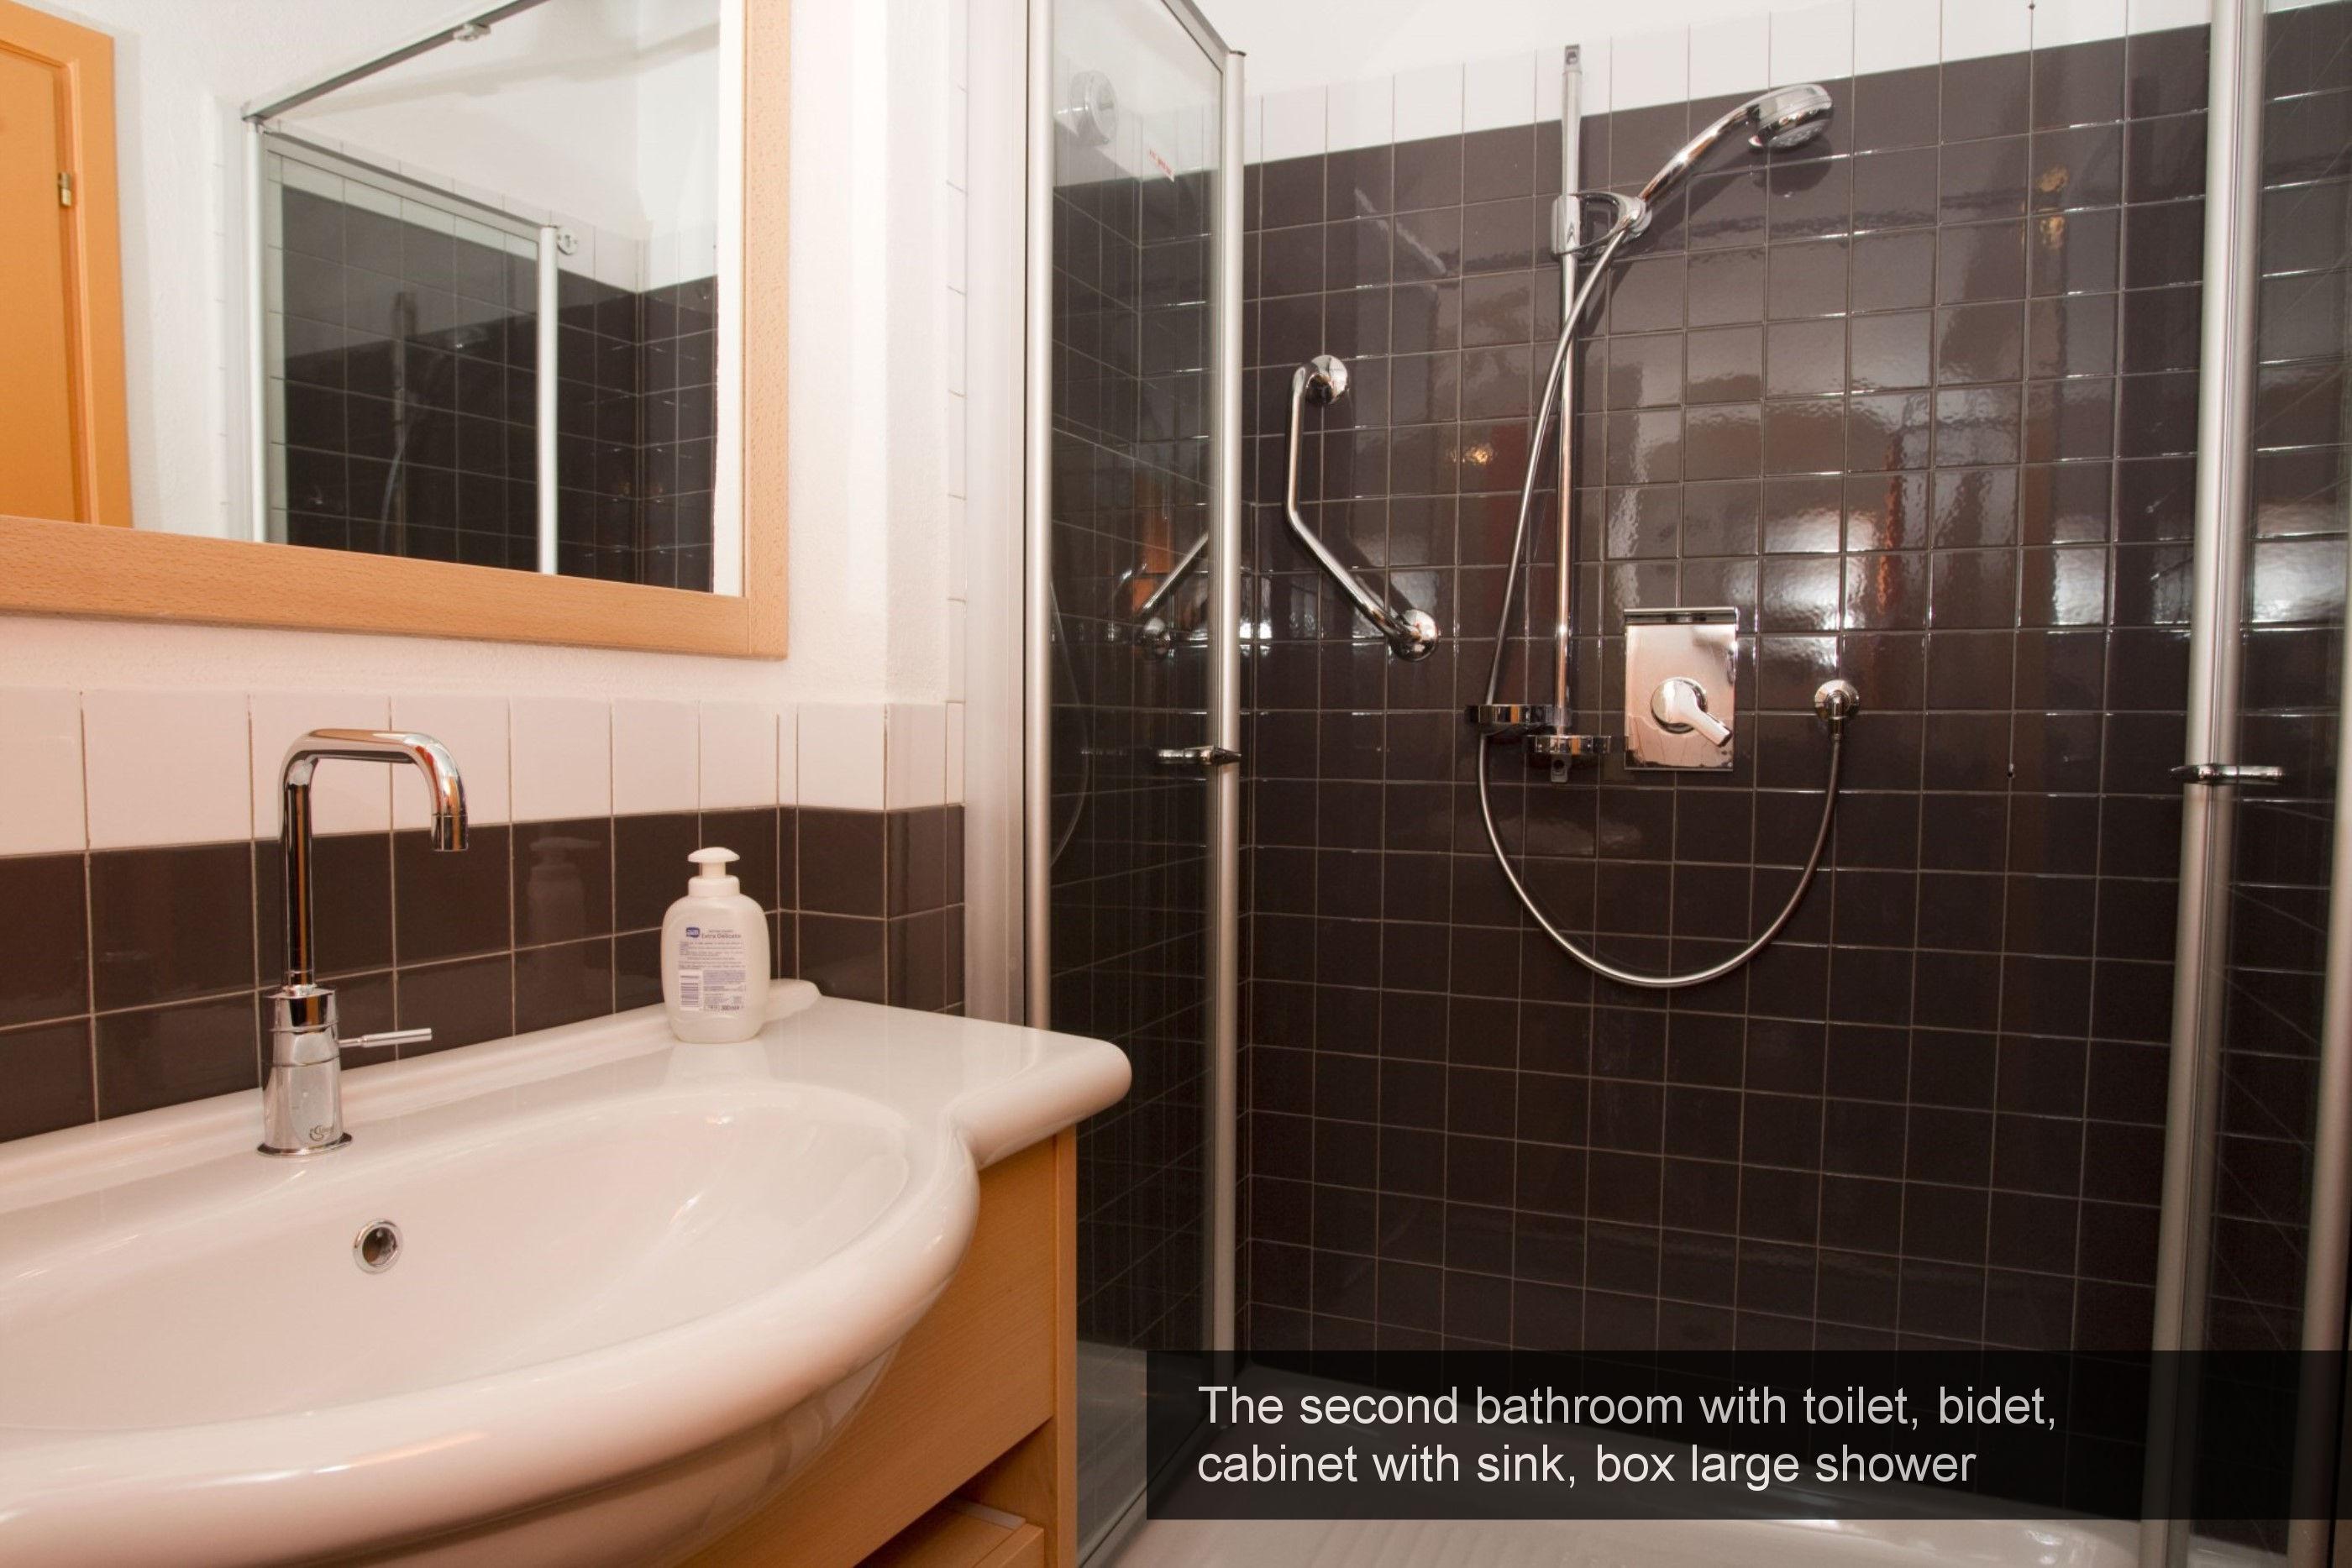 18) second bathroom, toilet, bidet, cabinet with sink, box large shower